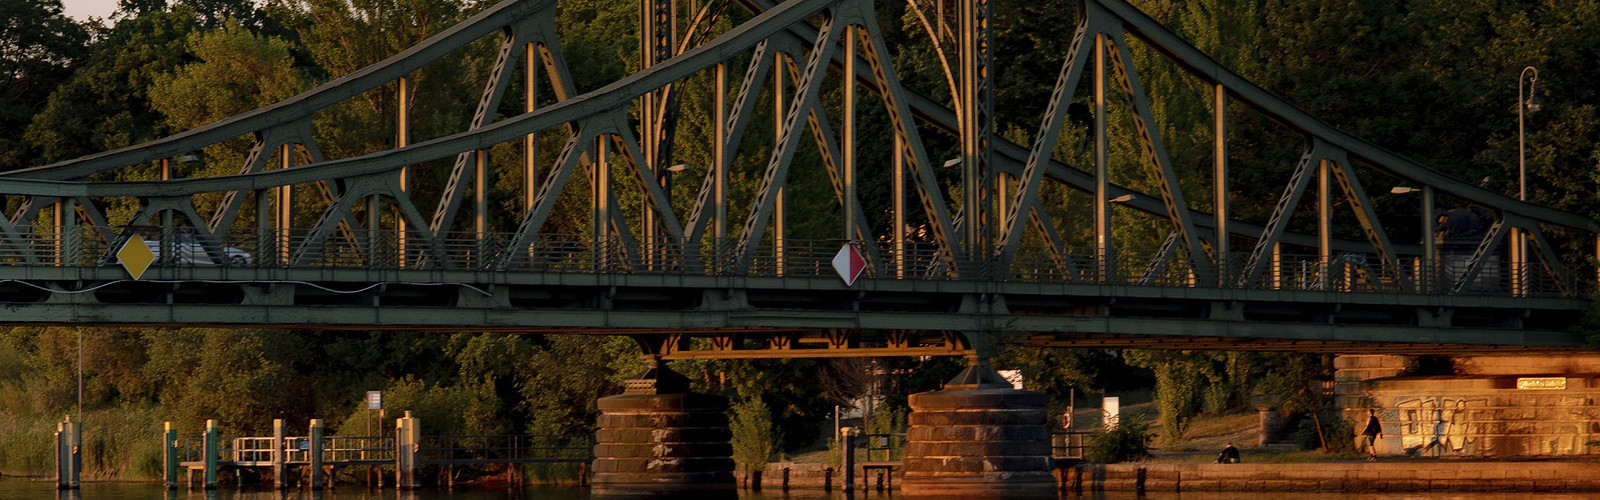 Glienicker Brücke - PMSG, Nadine Redlich